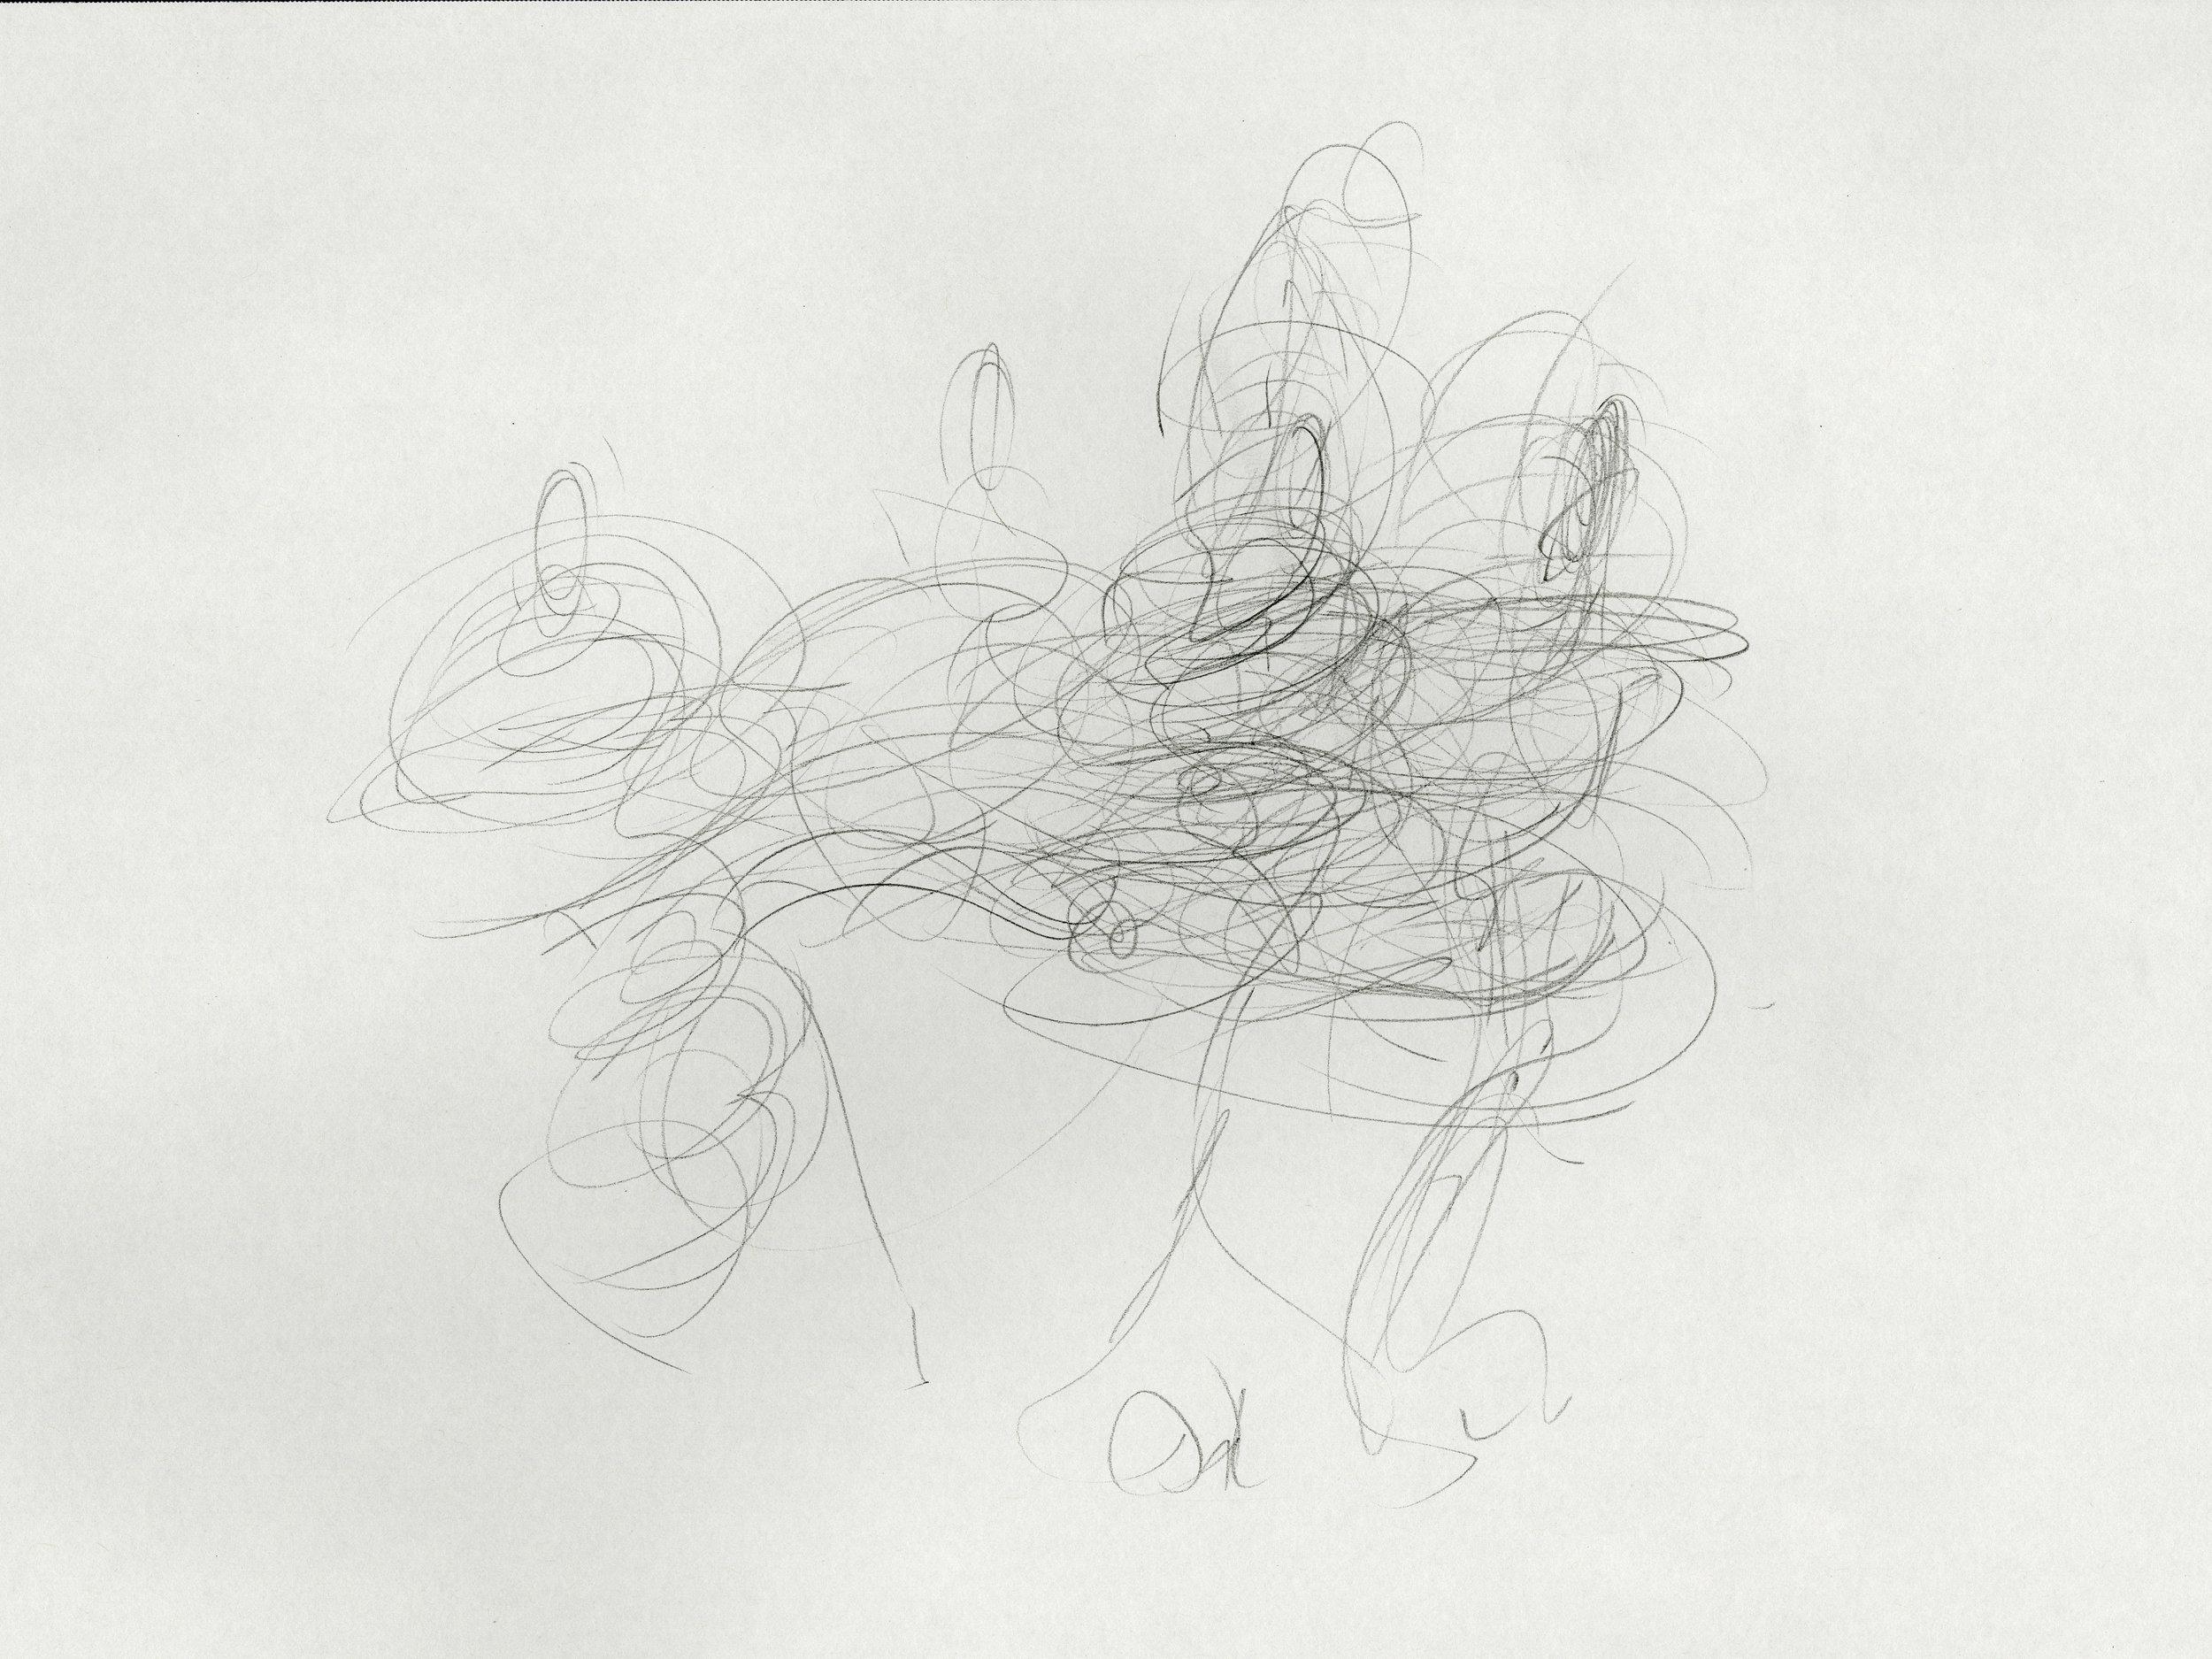 """The Thursday Sessions - 19 January - VII"" by James Grubola, graphite, POR"